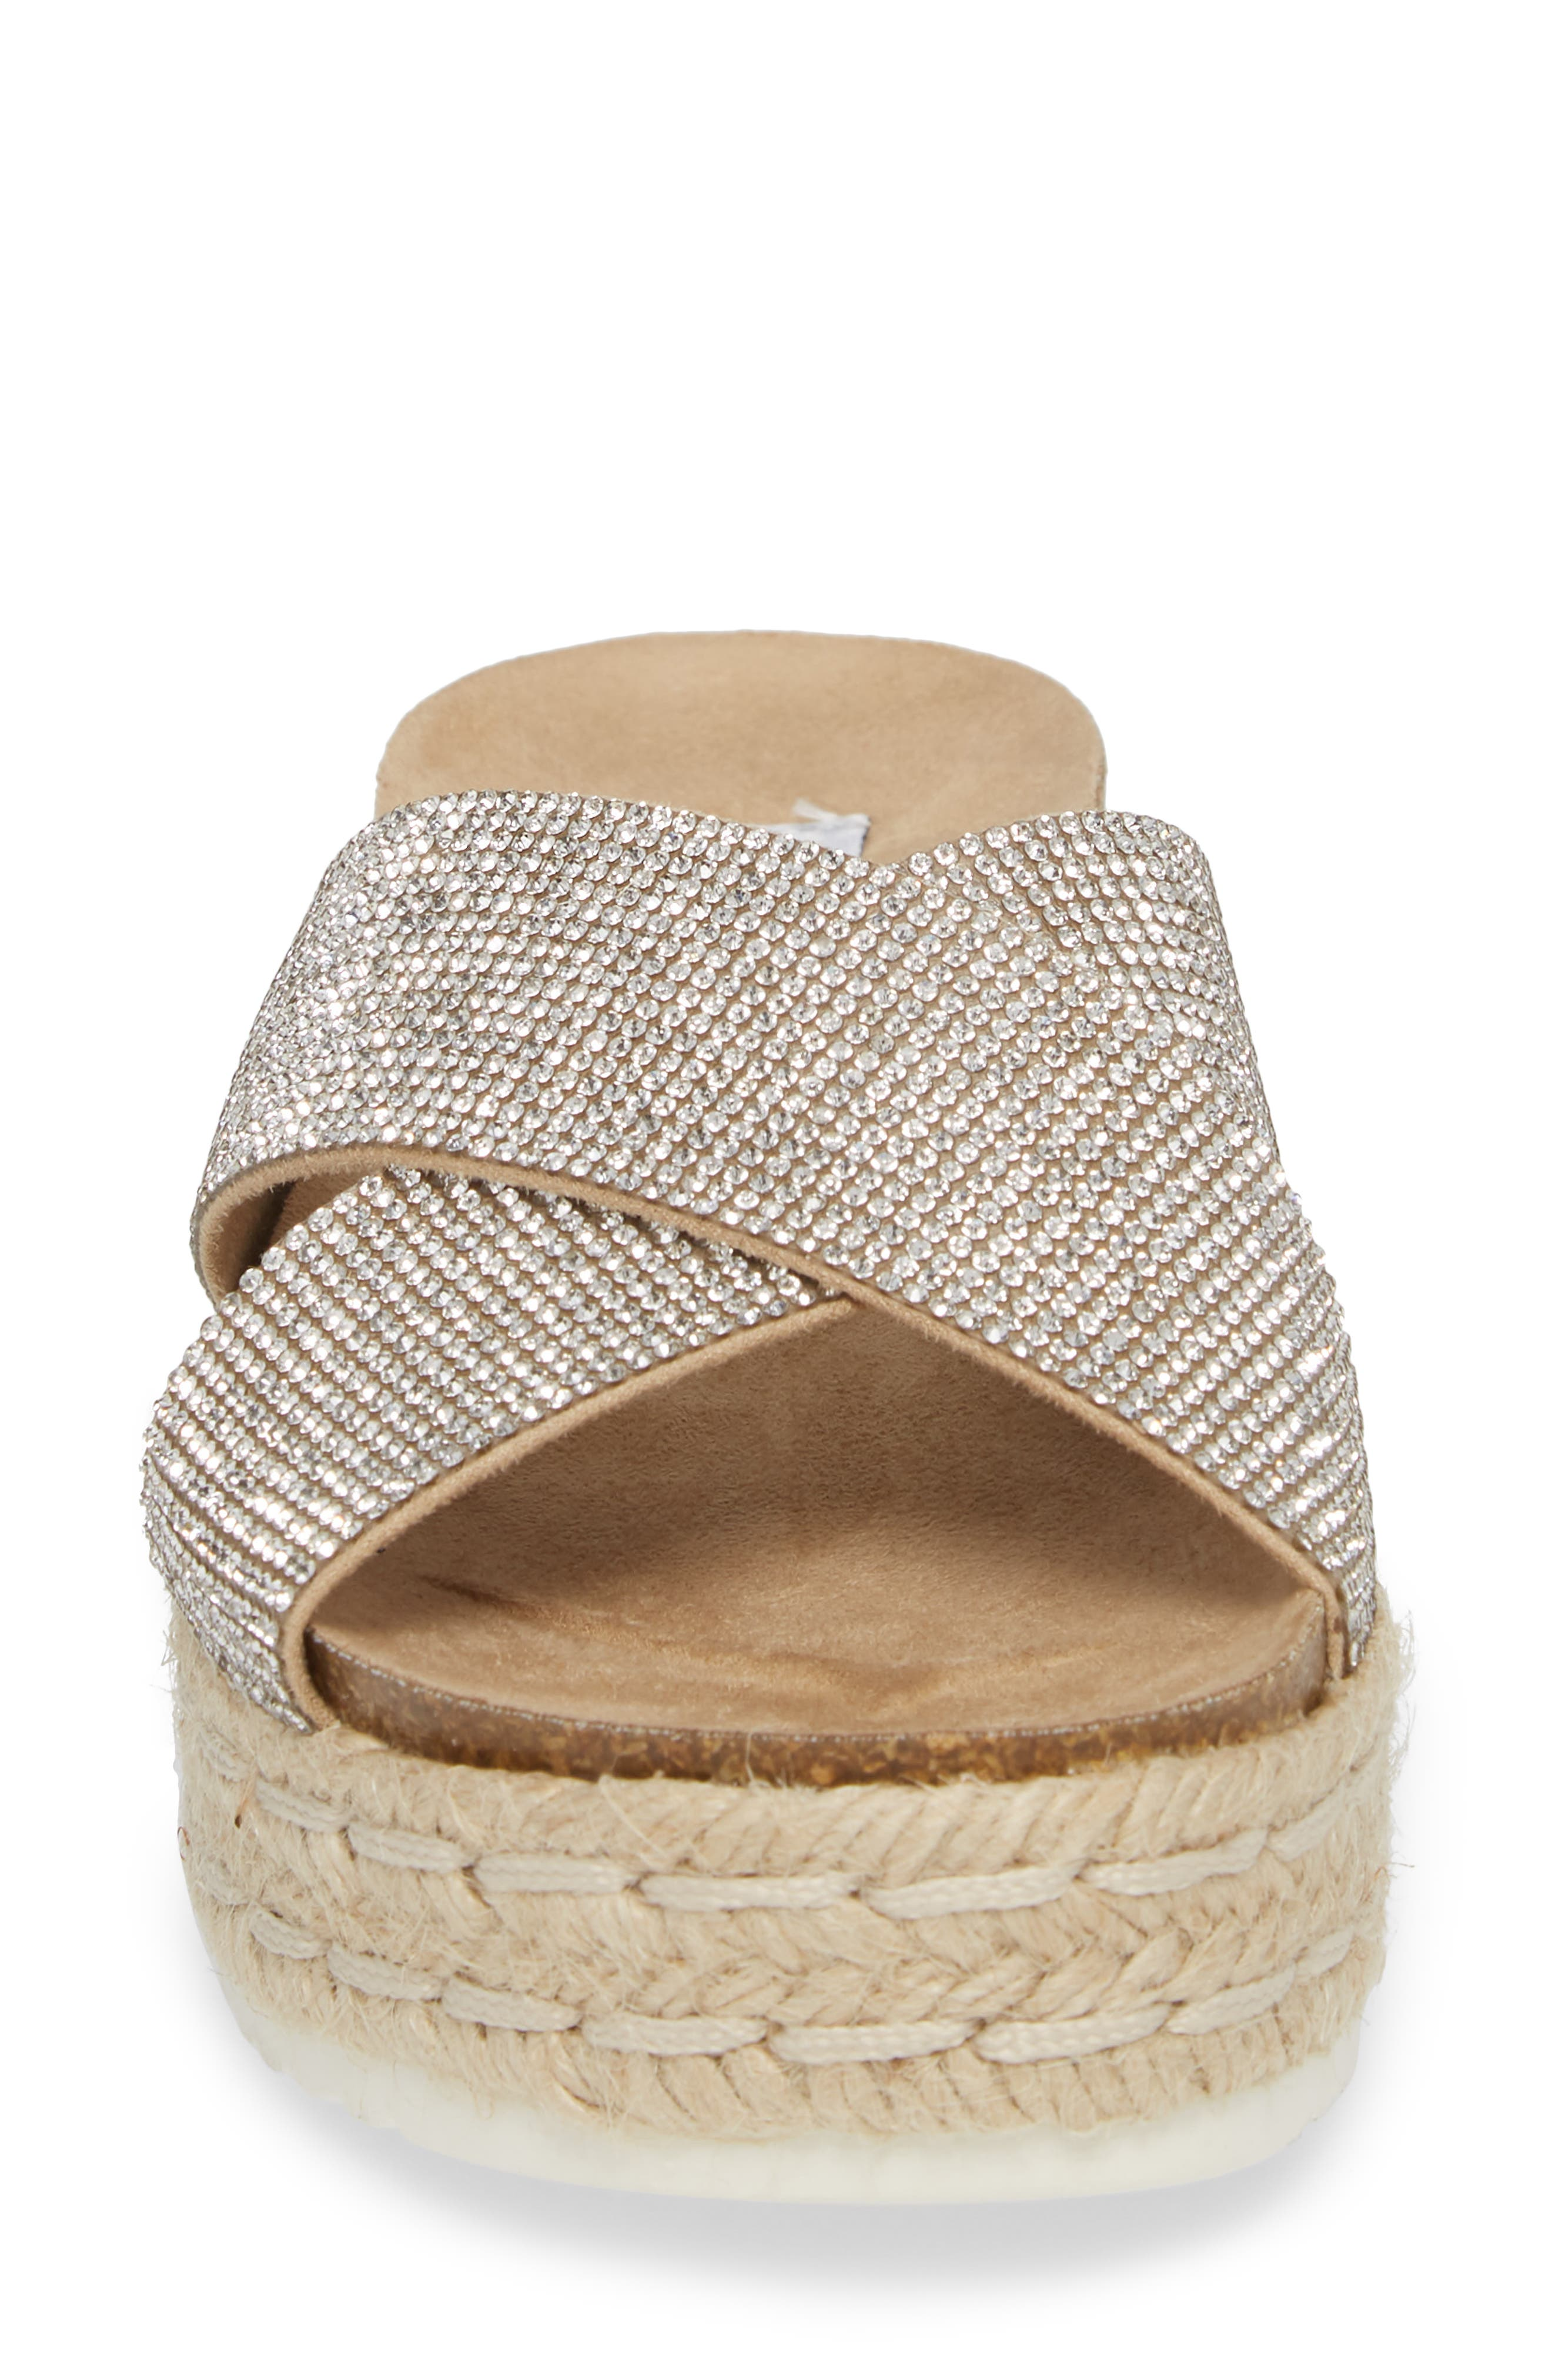 Arran-R Platform Espadrille Sandal,                             Alternate thumbnail 4, color,                             Silver